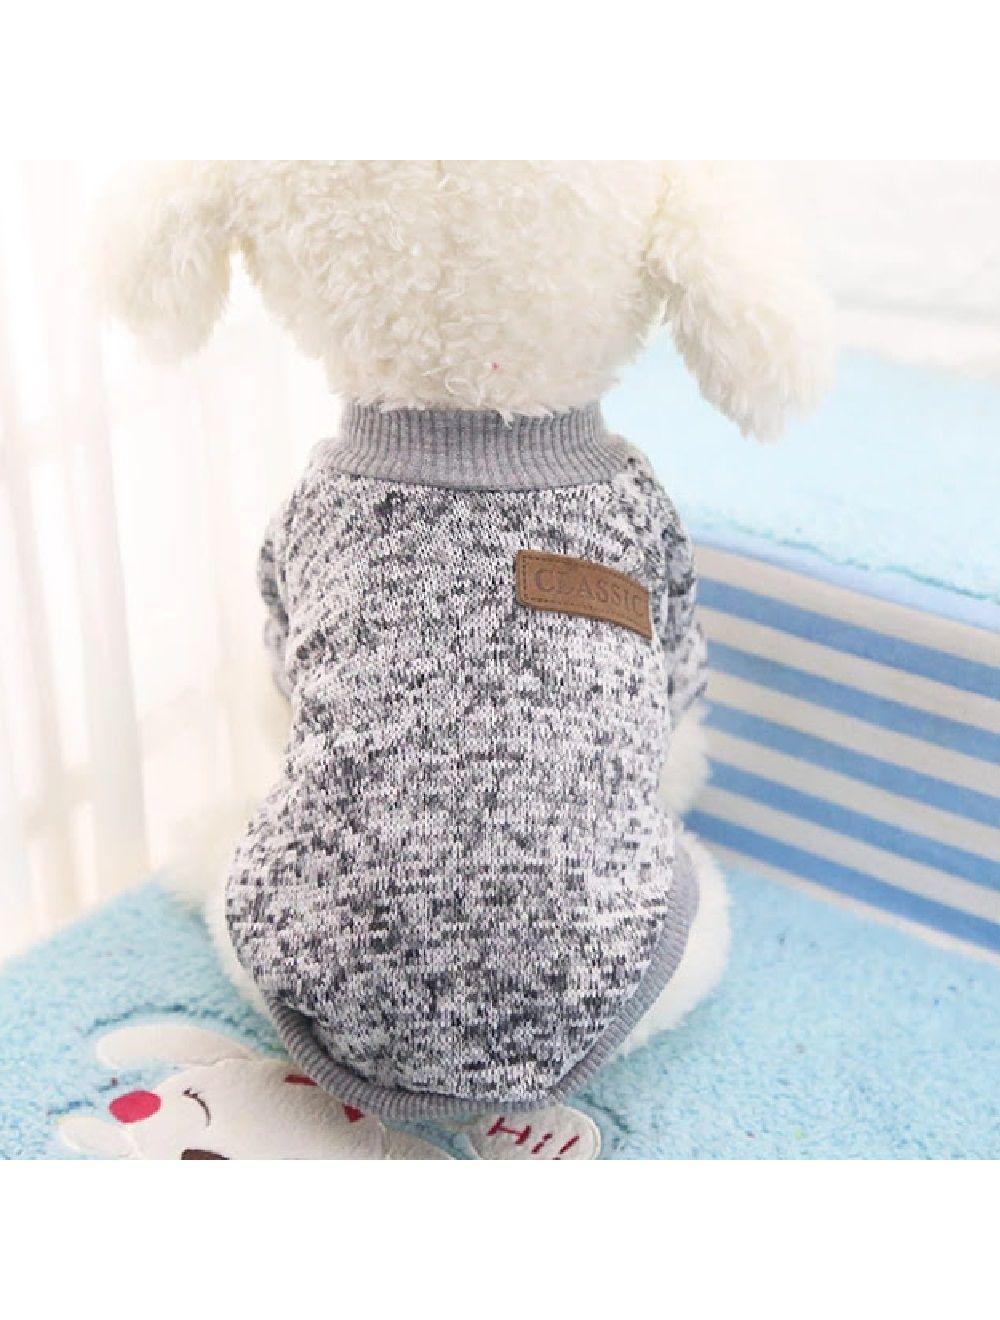 Suéter, buzo, abrigo para perro o gato Valentin For Pets en algodón Gris Talla XXL - Ciudaddemascotas.com